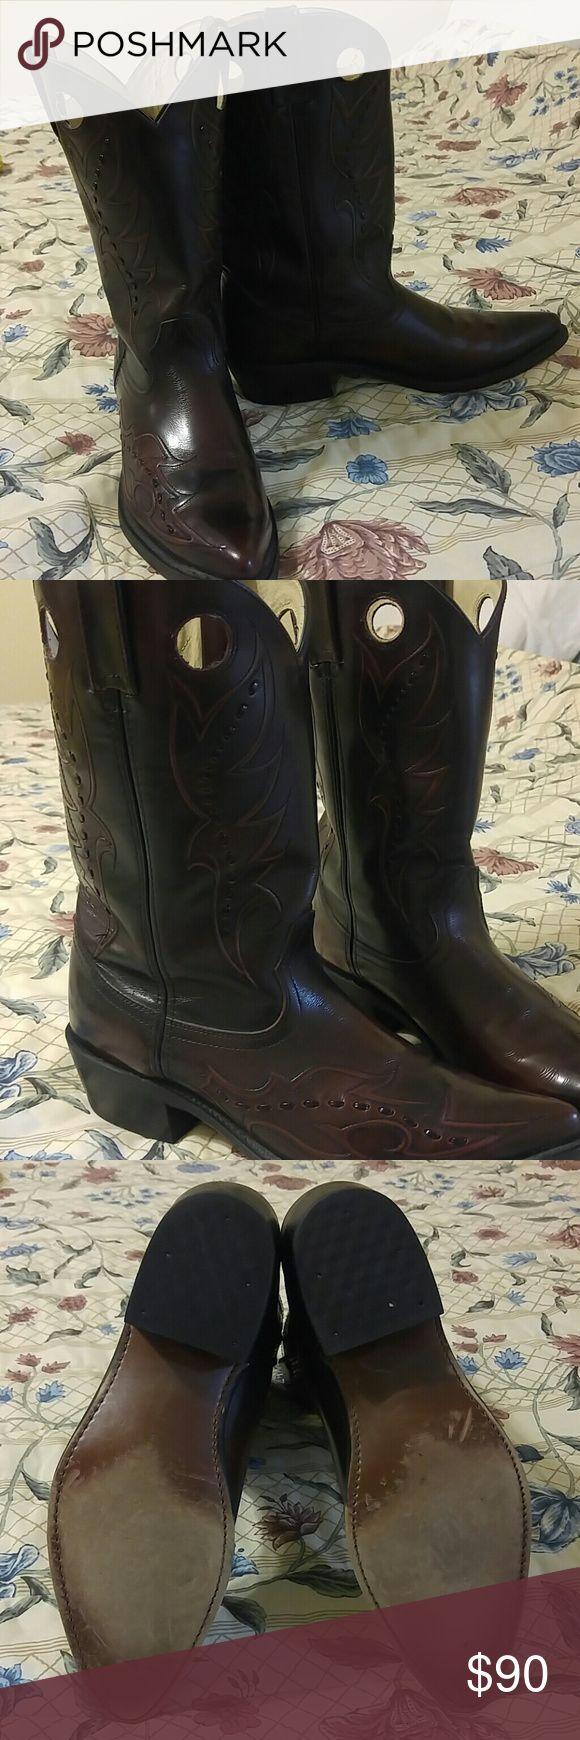 Men's Cowboy Boots Burgandy cowboy boots. Worn once. Durango Shoes Boots